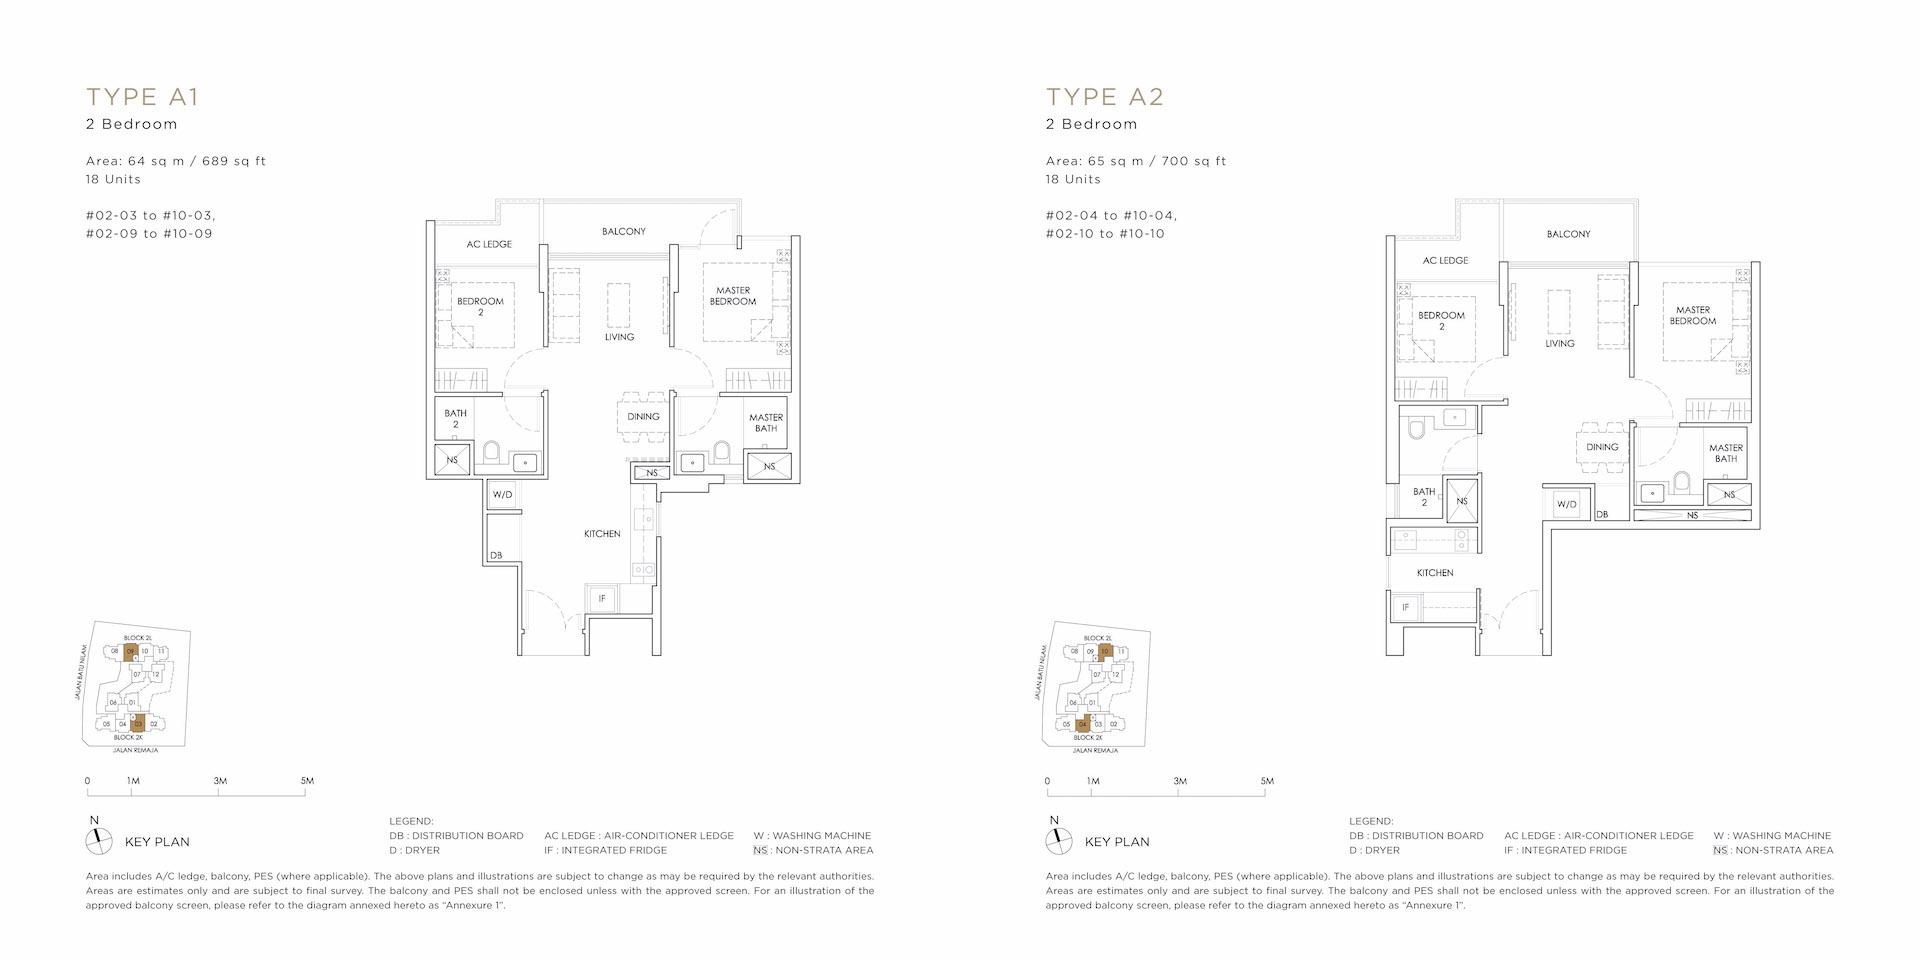 A1 A2 Floor Plan - MONT BOTANIK RESIDENCE